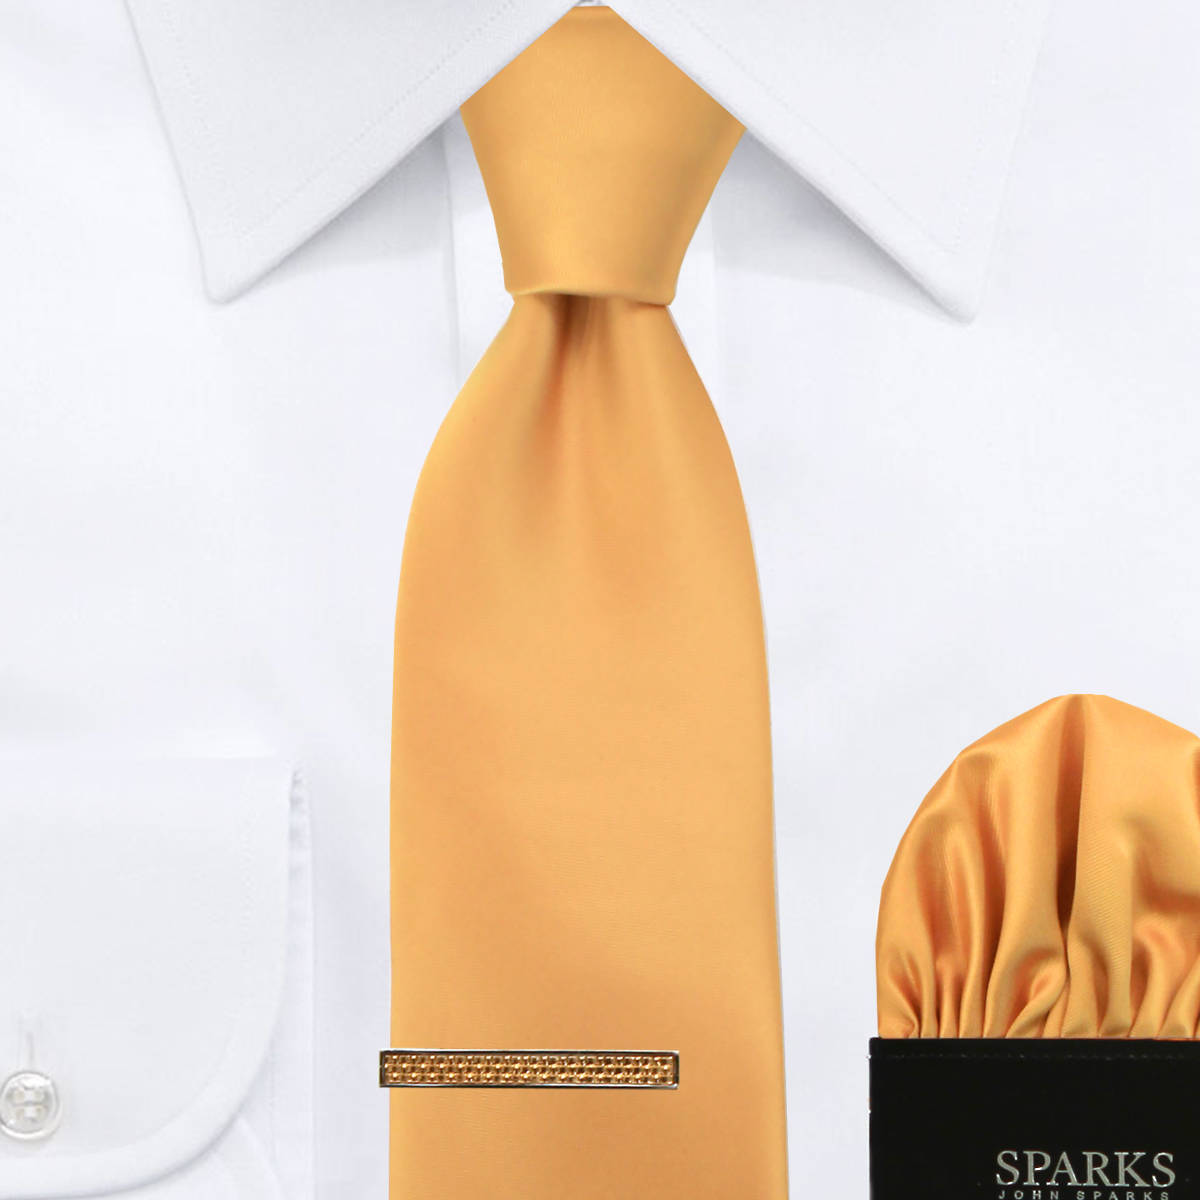 00da1618bfe0 JOHN SPARKS Gold – Tie + Pocket Square + Tie Bar – Shop Hermoso New York  and John Sparks! john sparks hermoso new york necktie, bow tie, shirt, ...